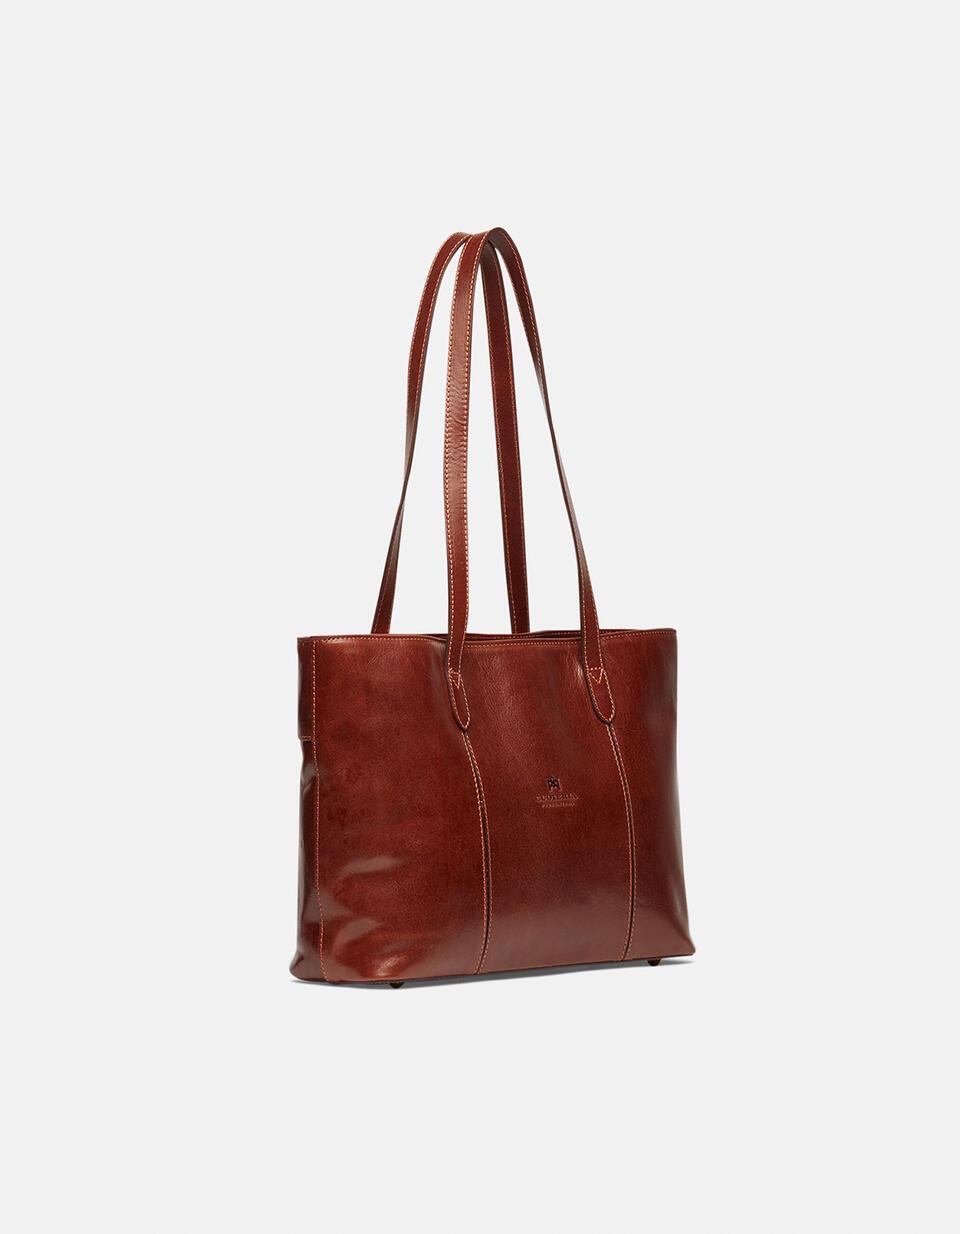 Warm and Colour large leather shopping bag MARRONE Cuoieria Fiorentina